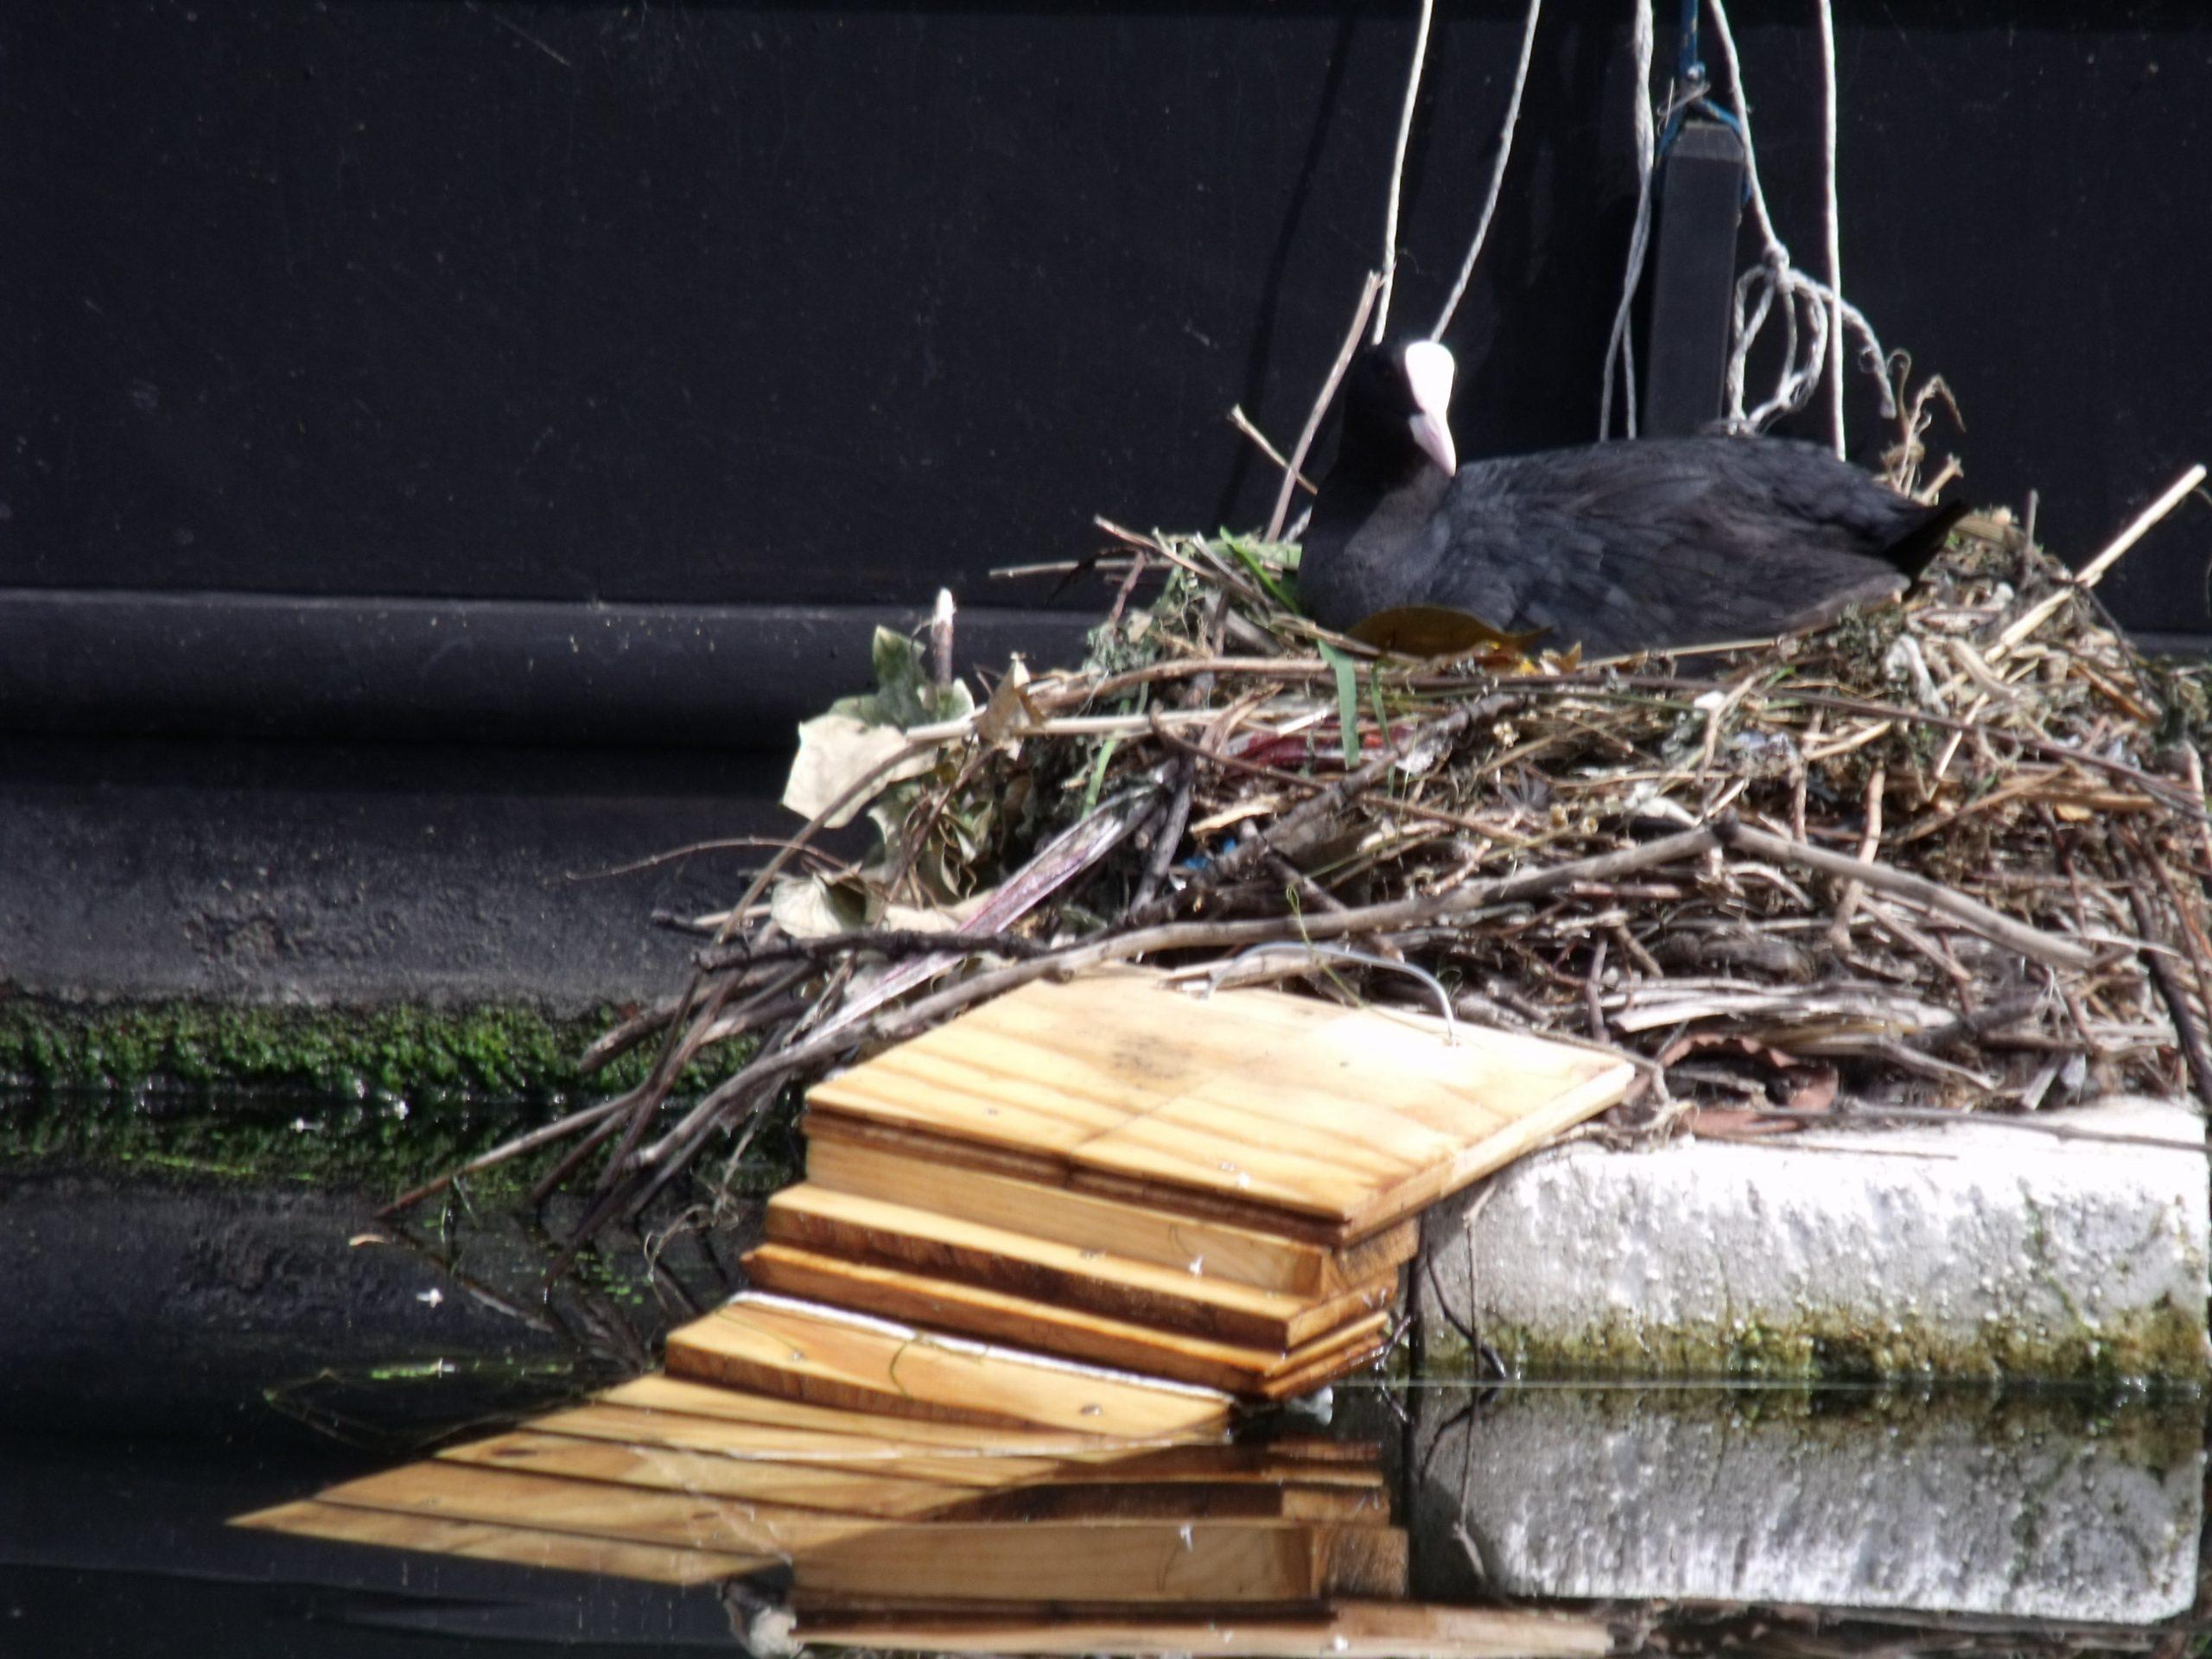 Coot's nest on the Grand Union Canal near Paddington